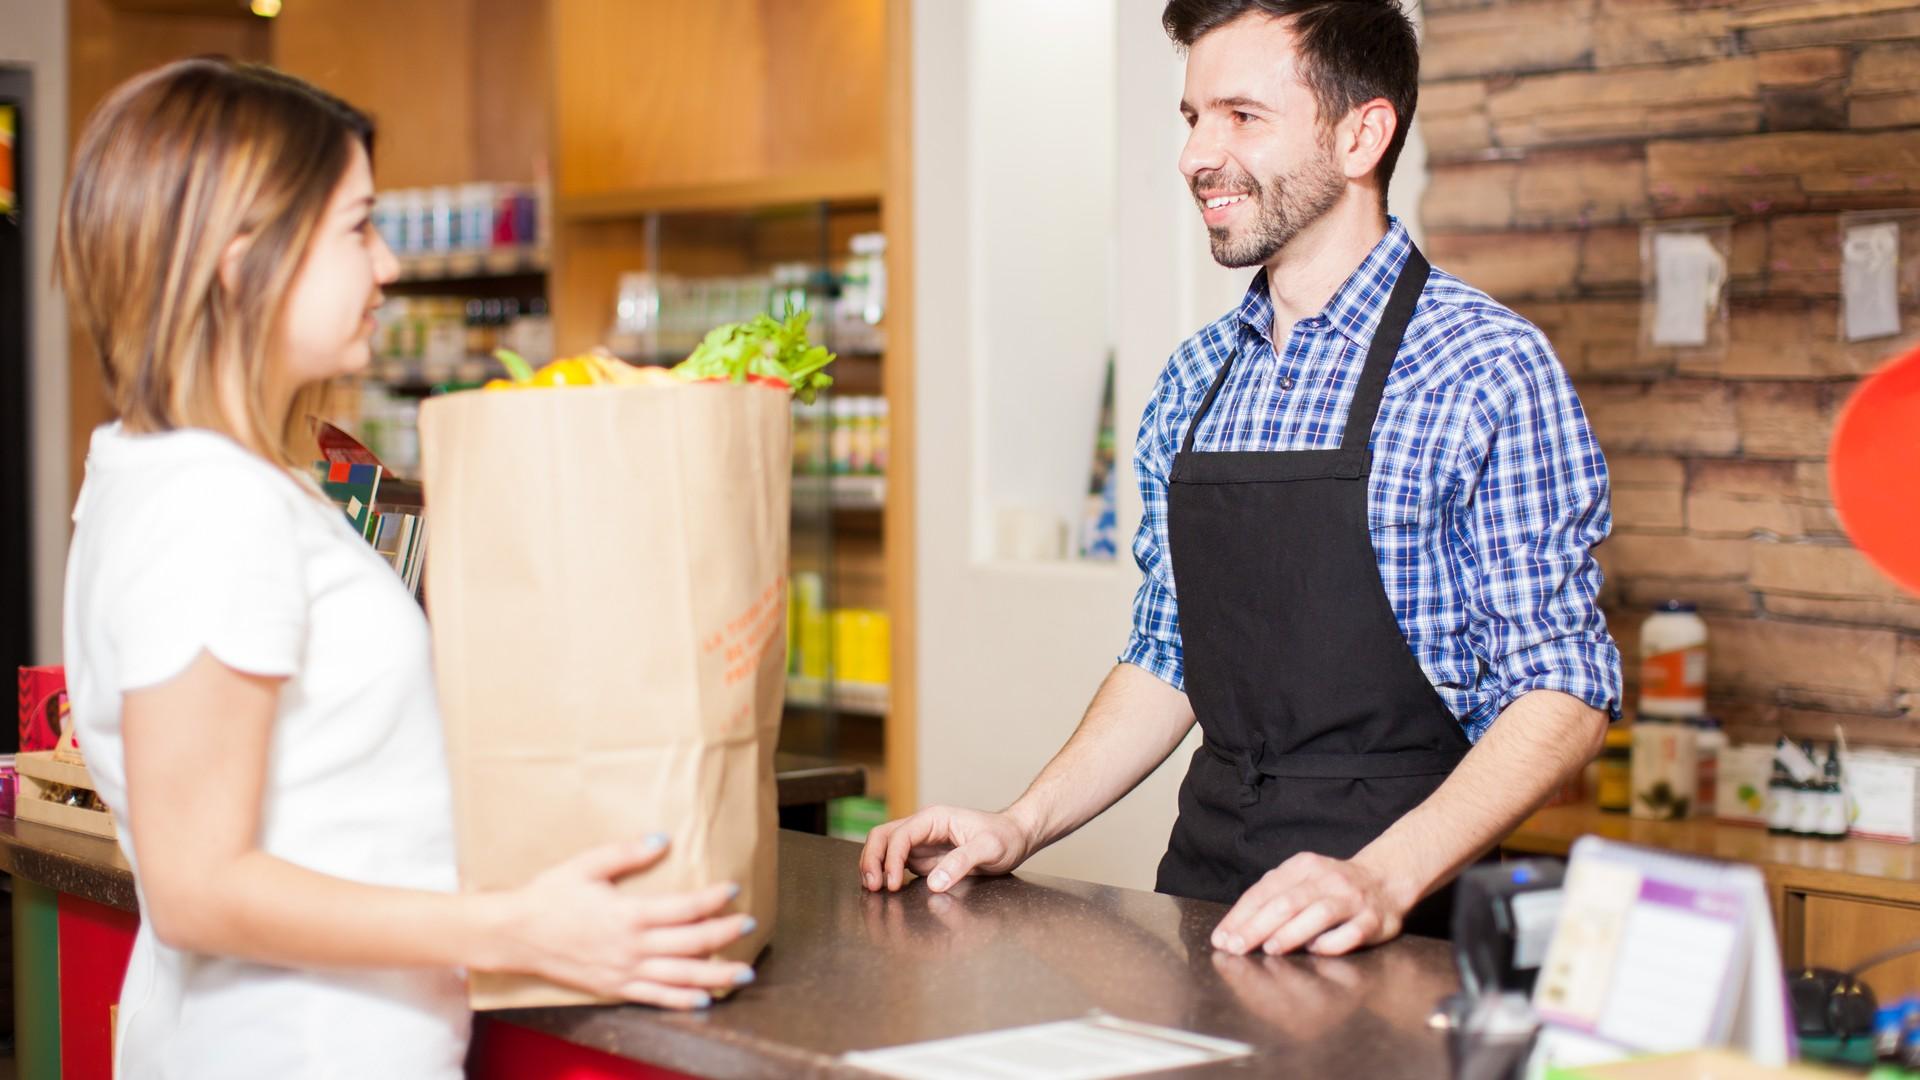 Cash-handling-Convenience-store-16-9